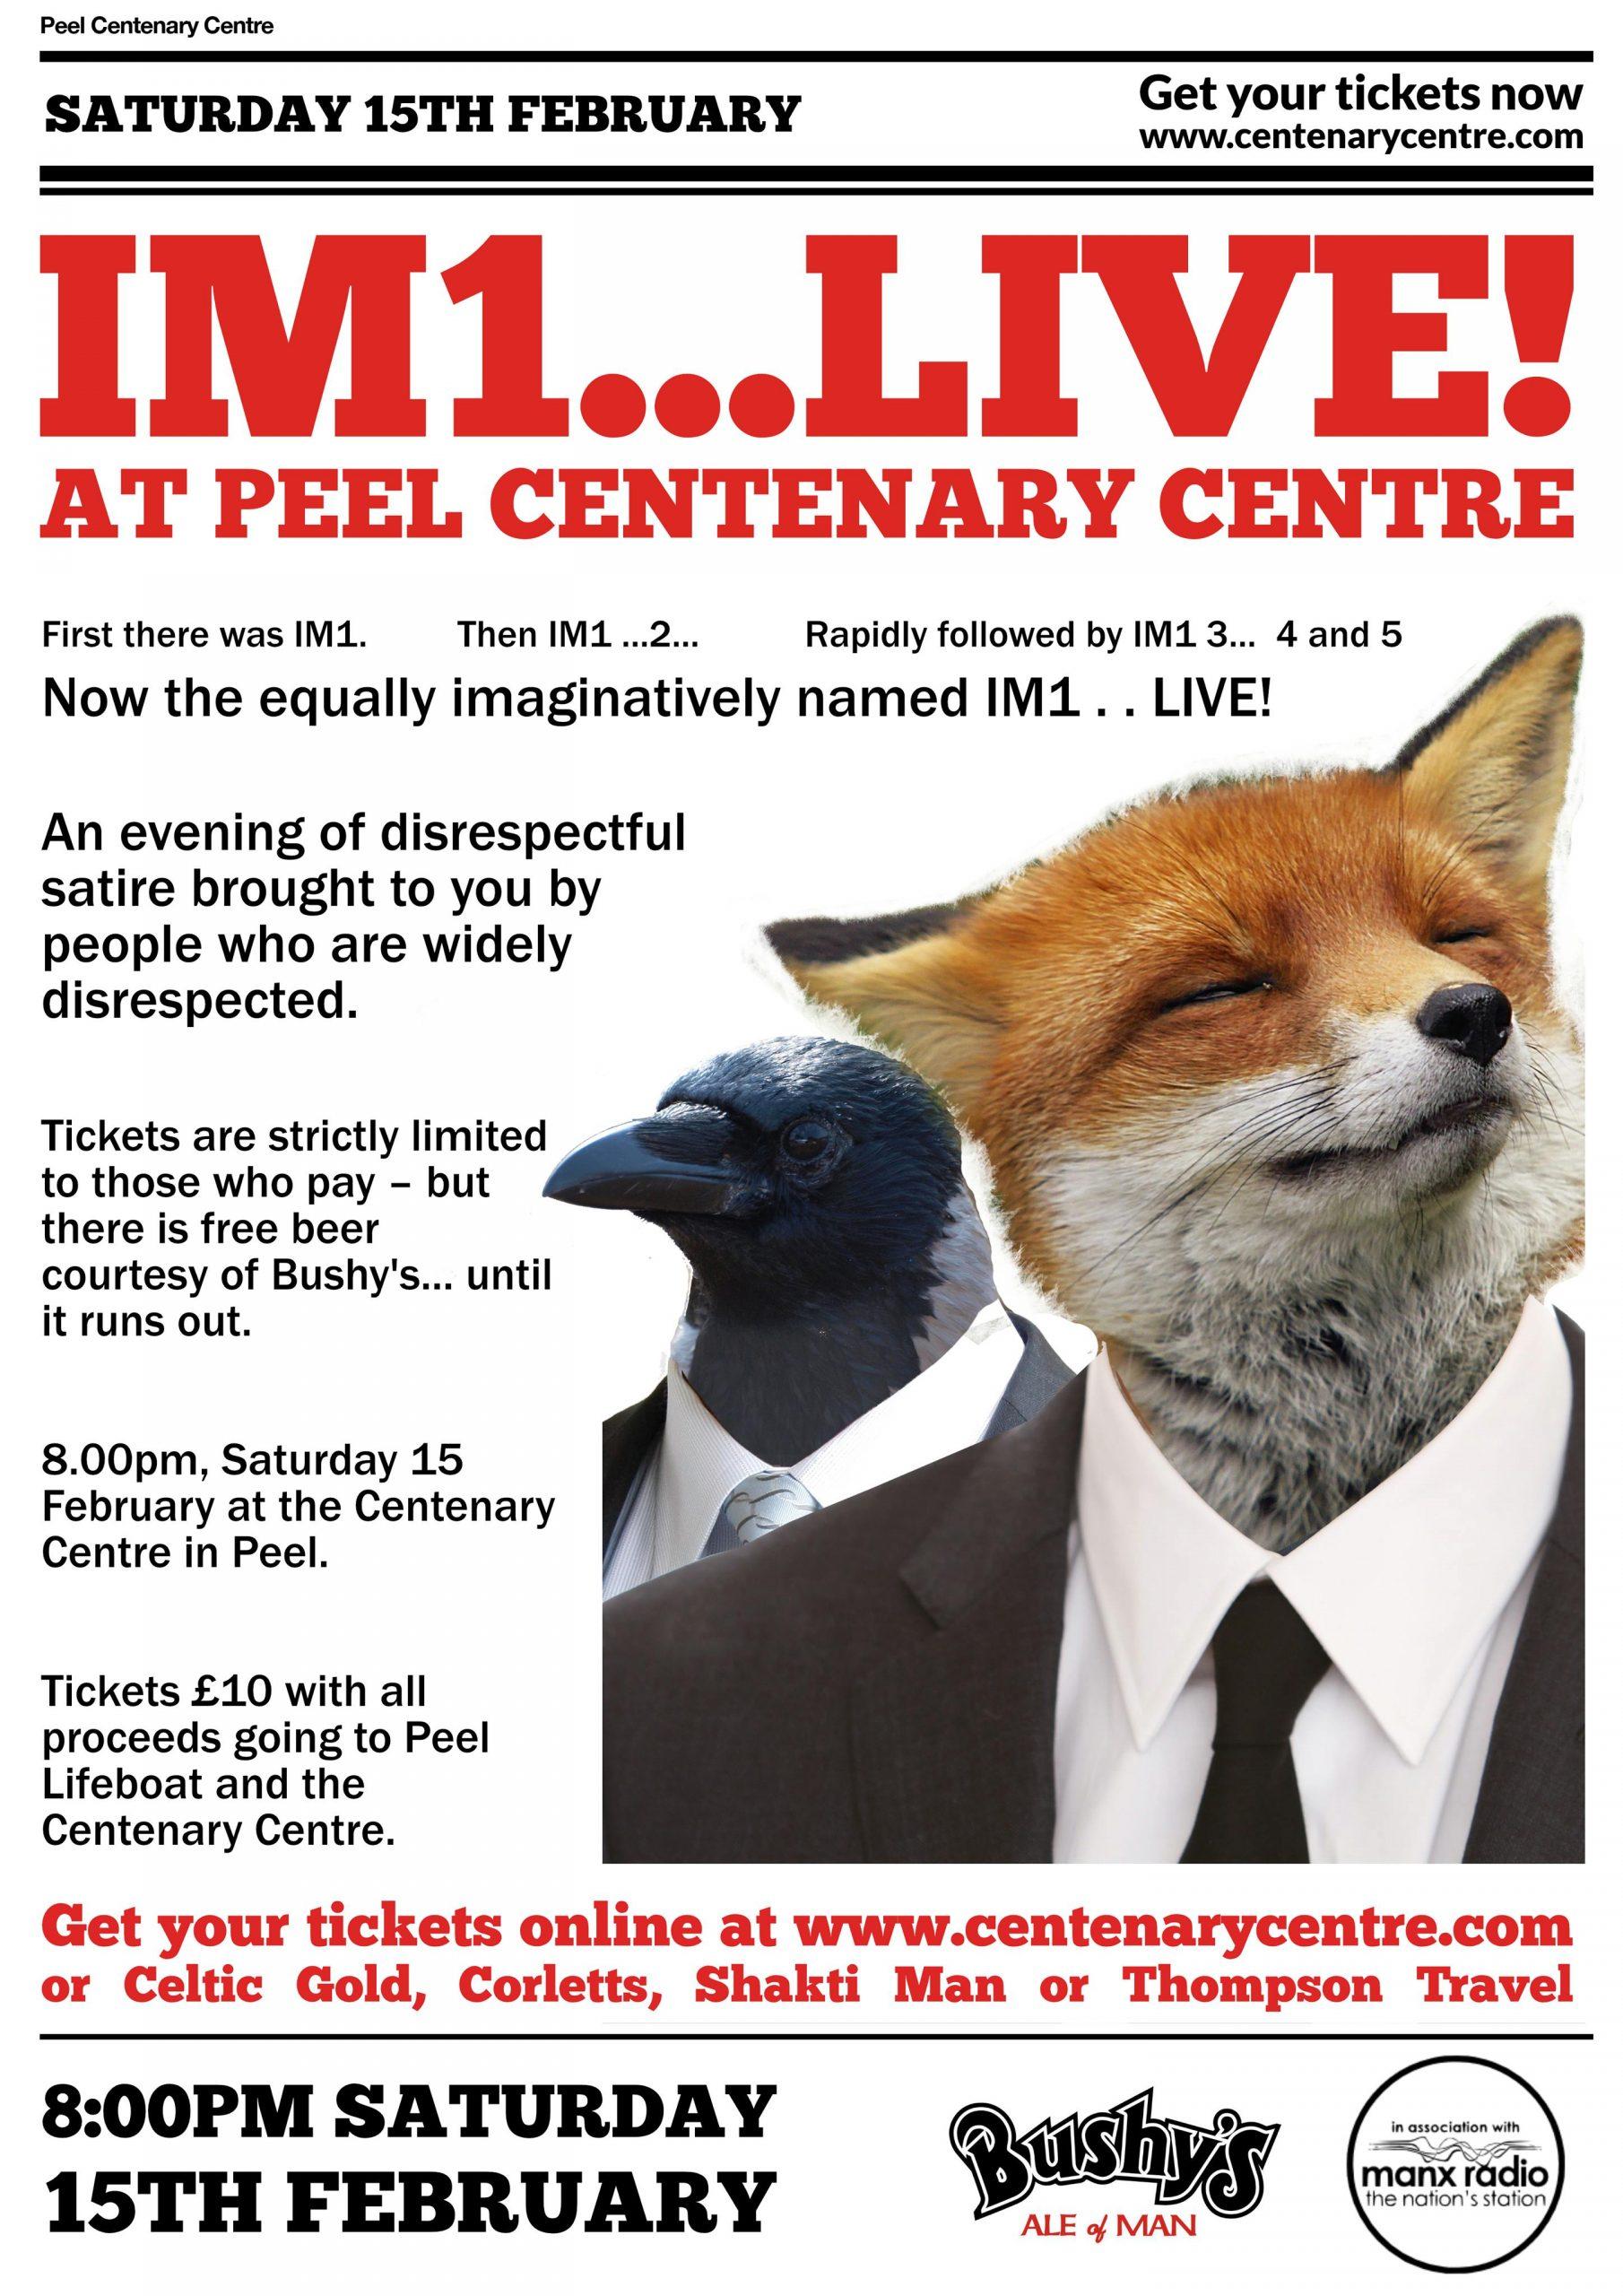 IM1...LIve! (An evening of disrespectful satire) @ Peel Centenary Centre